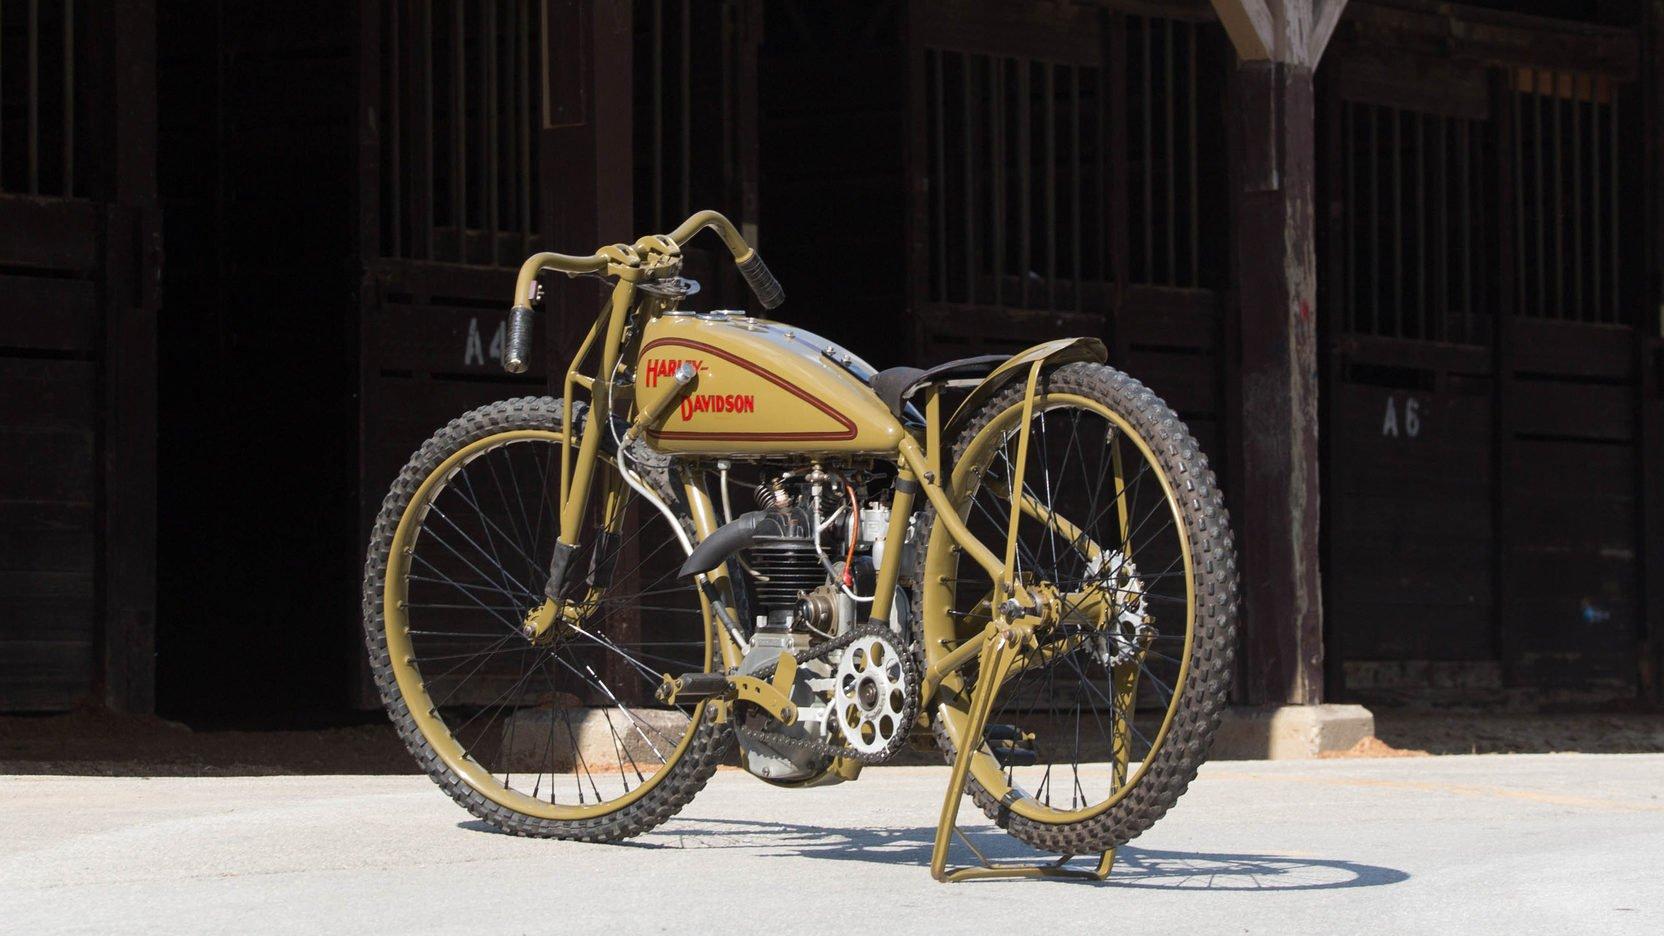 1928 Harley Davidson Ohv 350cc Peashooter: 1928 Harley-Davidson Peashooter